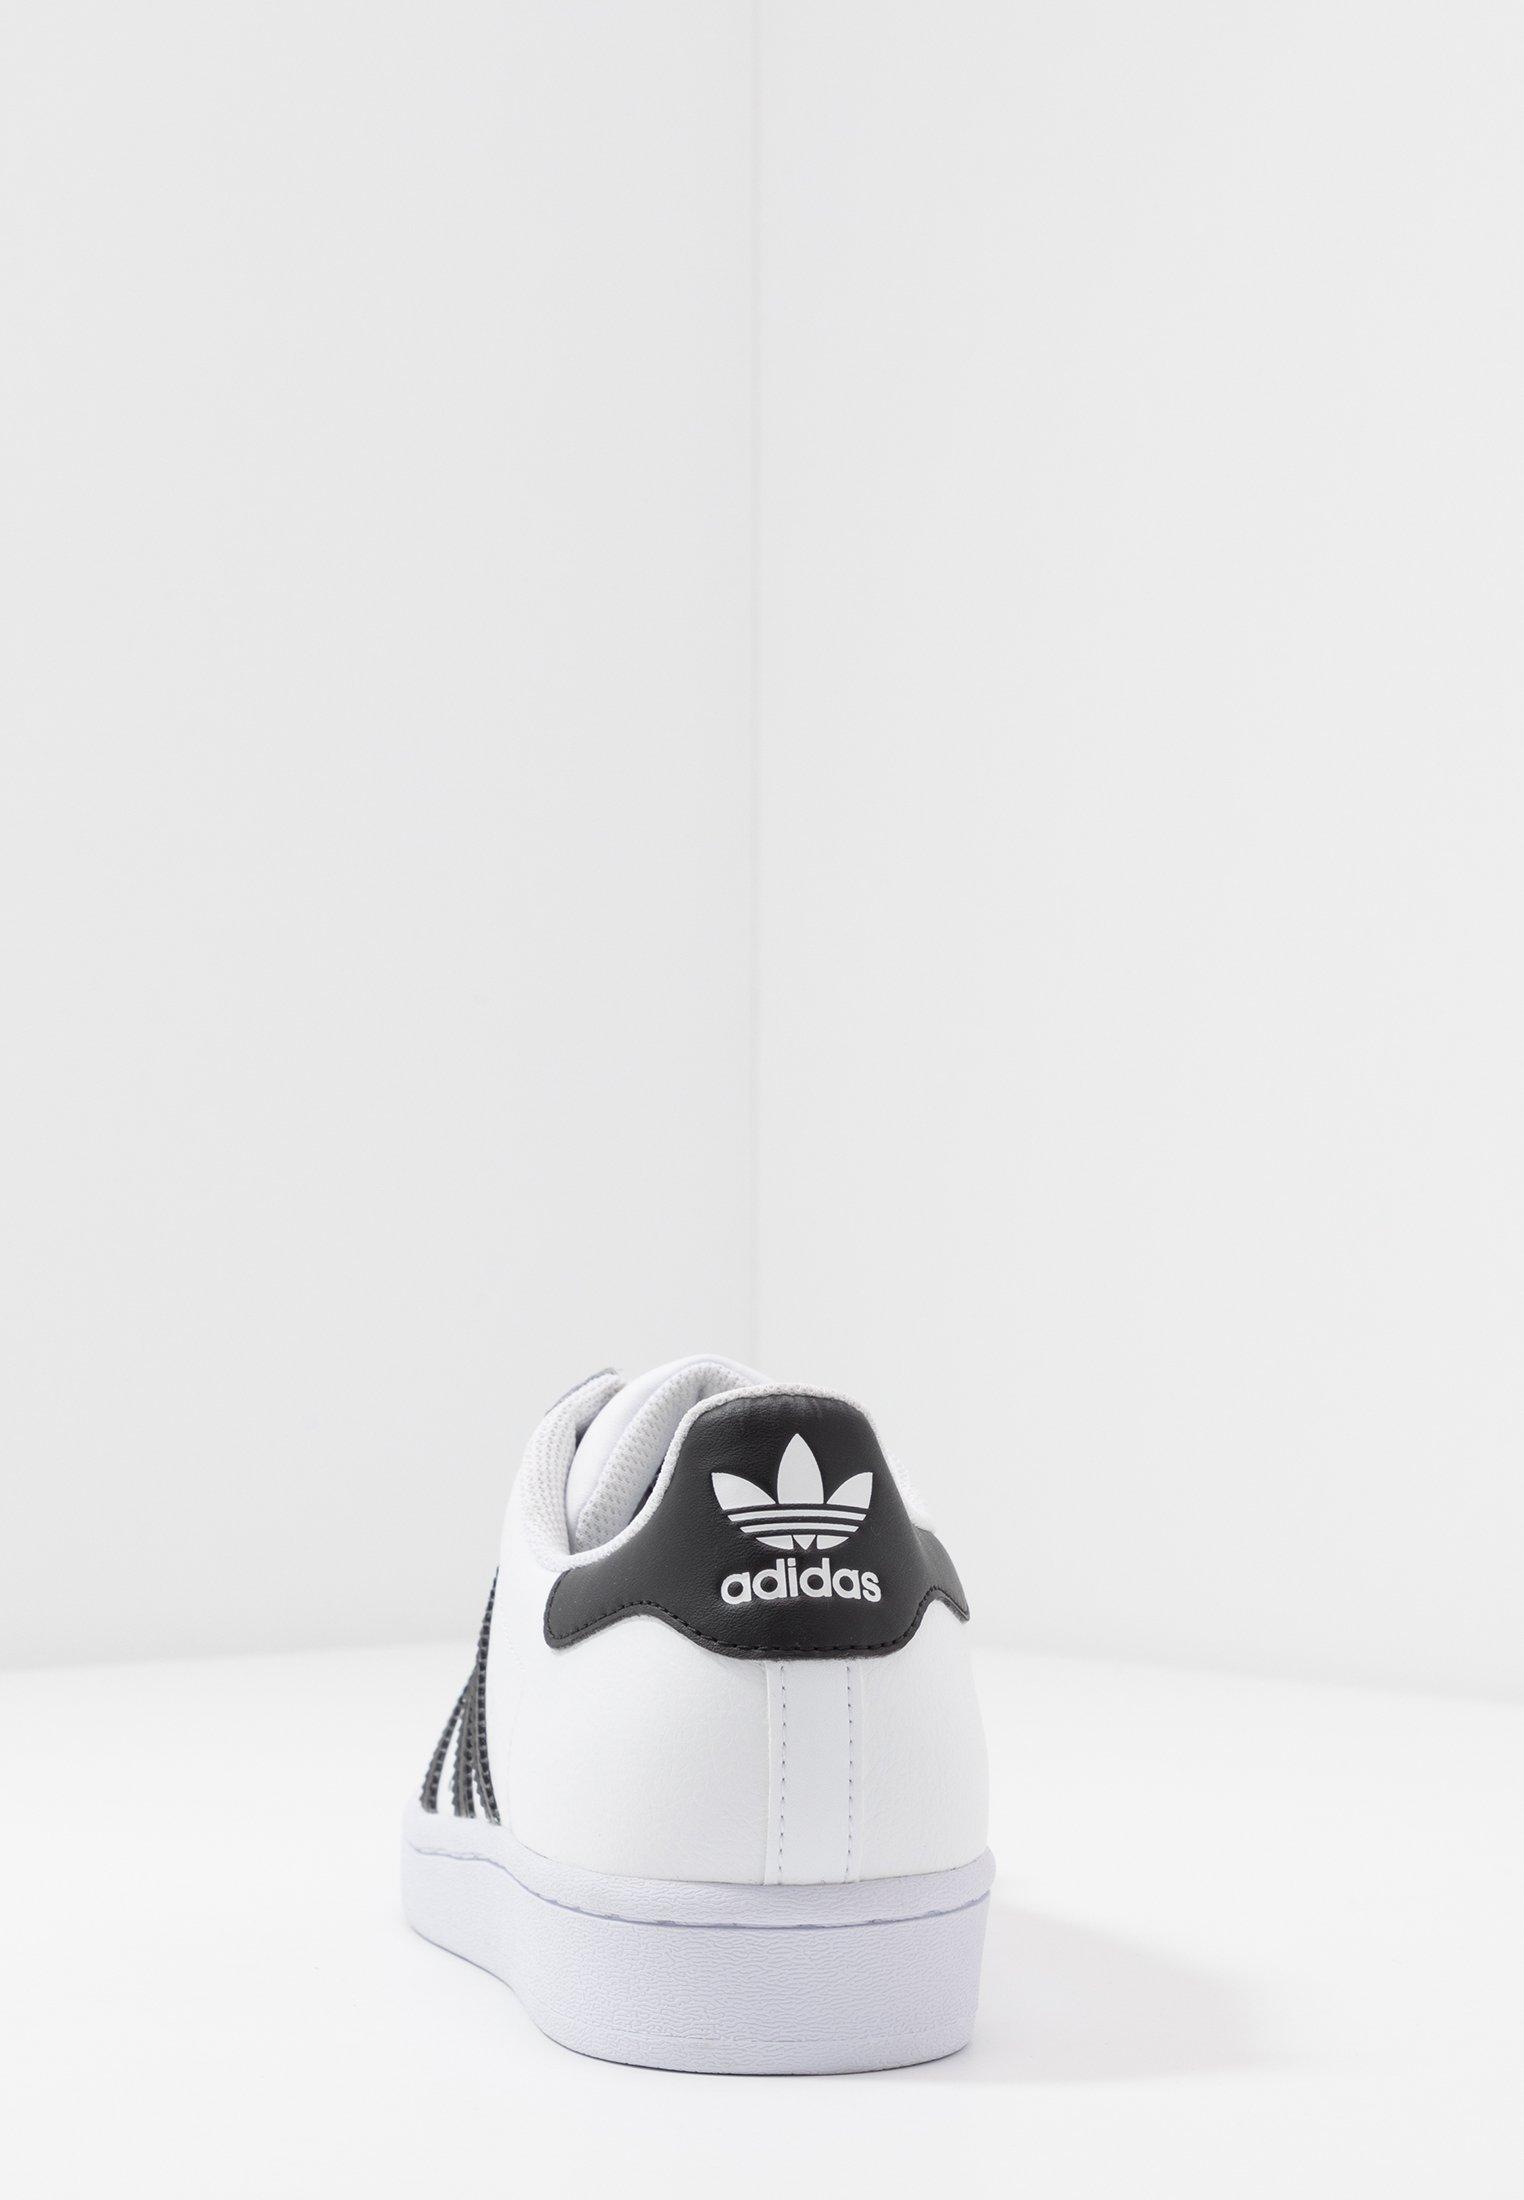 Adidas Originals Superstar - Sneakers Basse Footwear White/core Black azyok49